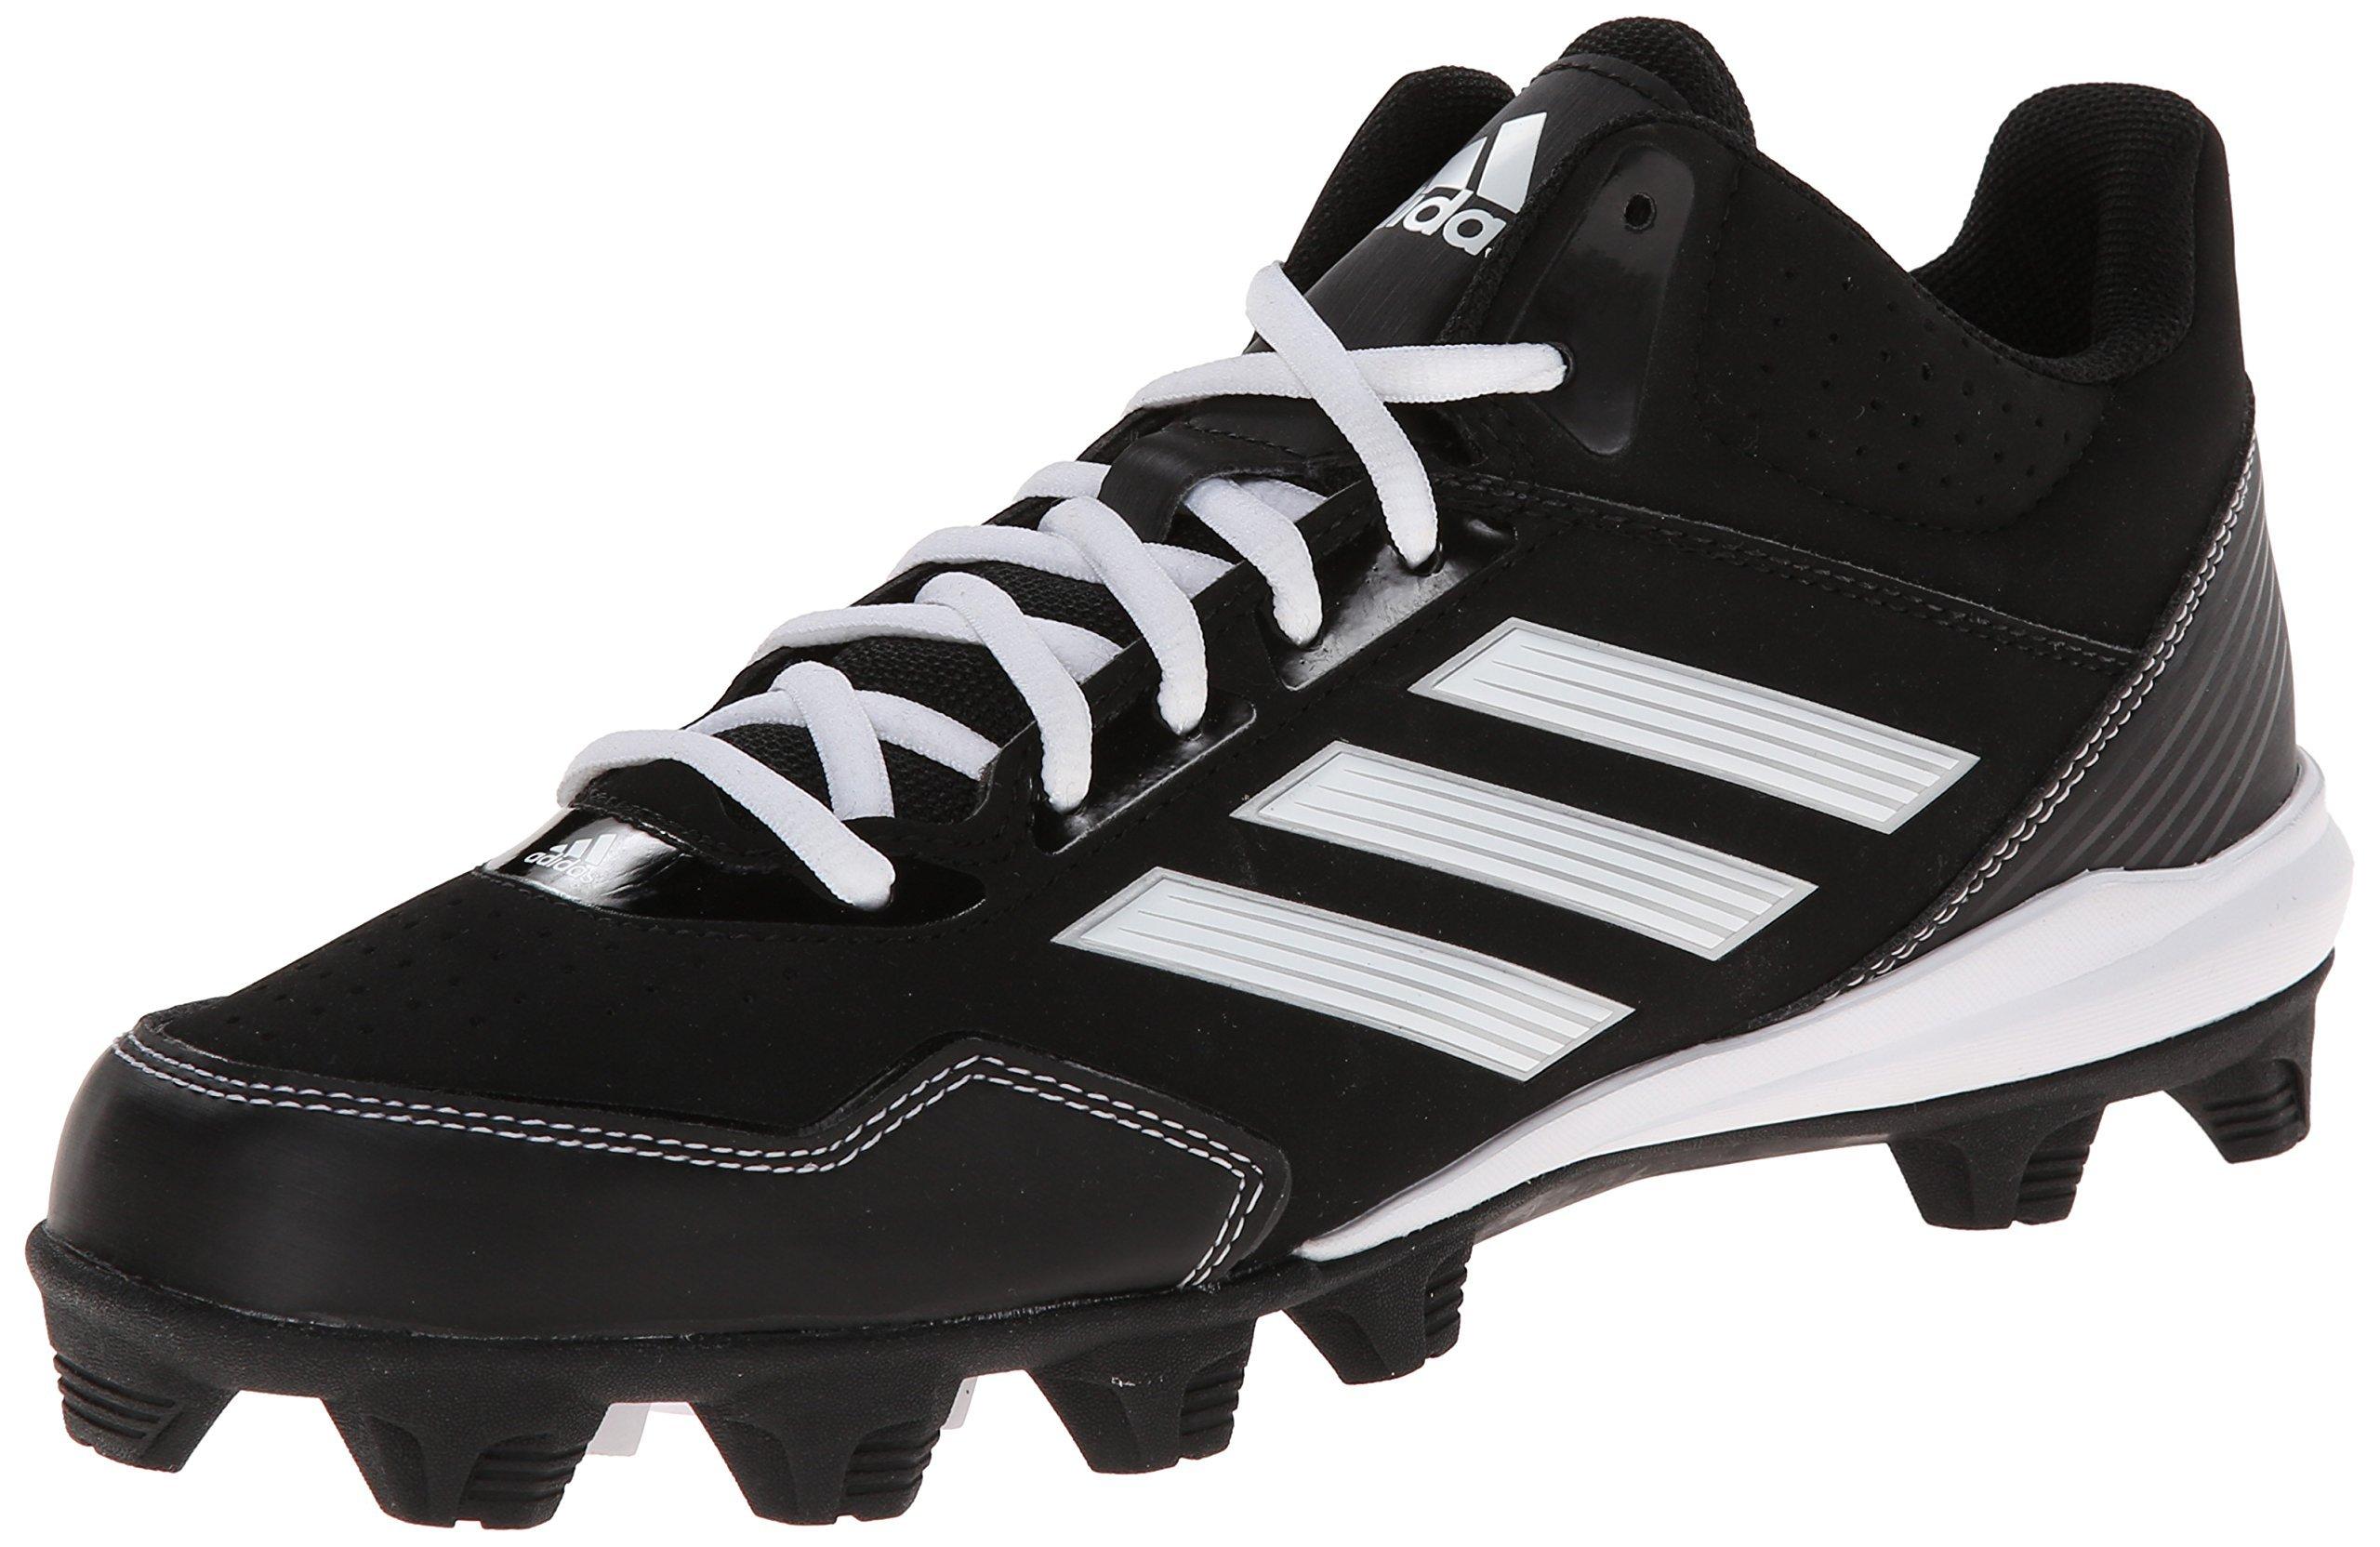 adidas Performance Men's Wheelhouse Mid Baseball Cleat, Core Black/Running White/Metallic/Silver, 8 M US by adidas